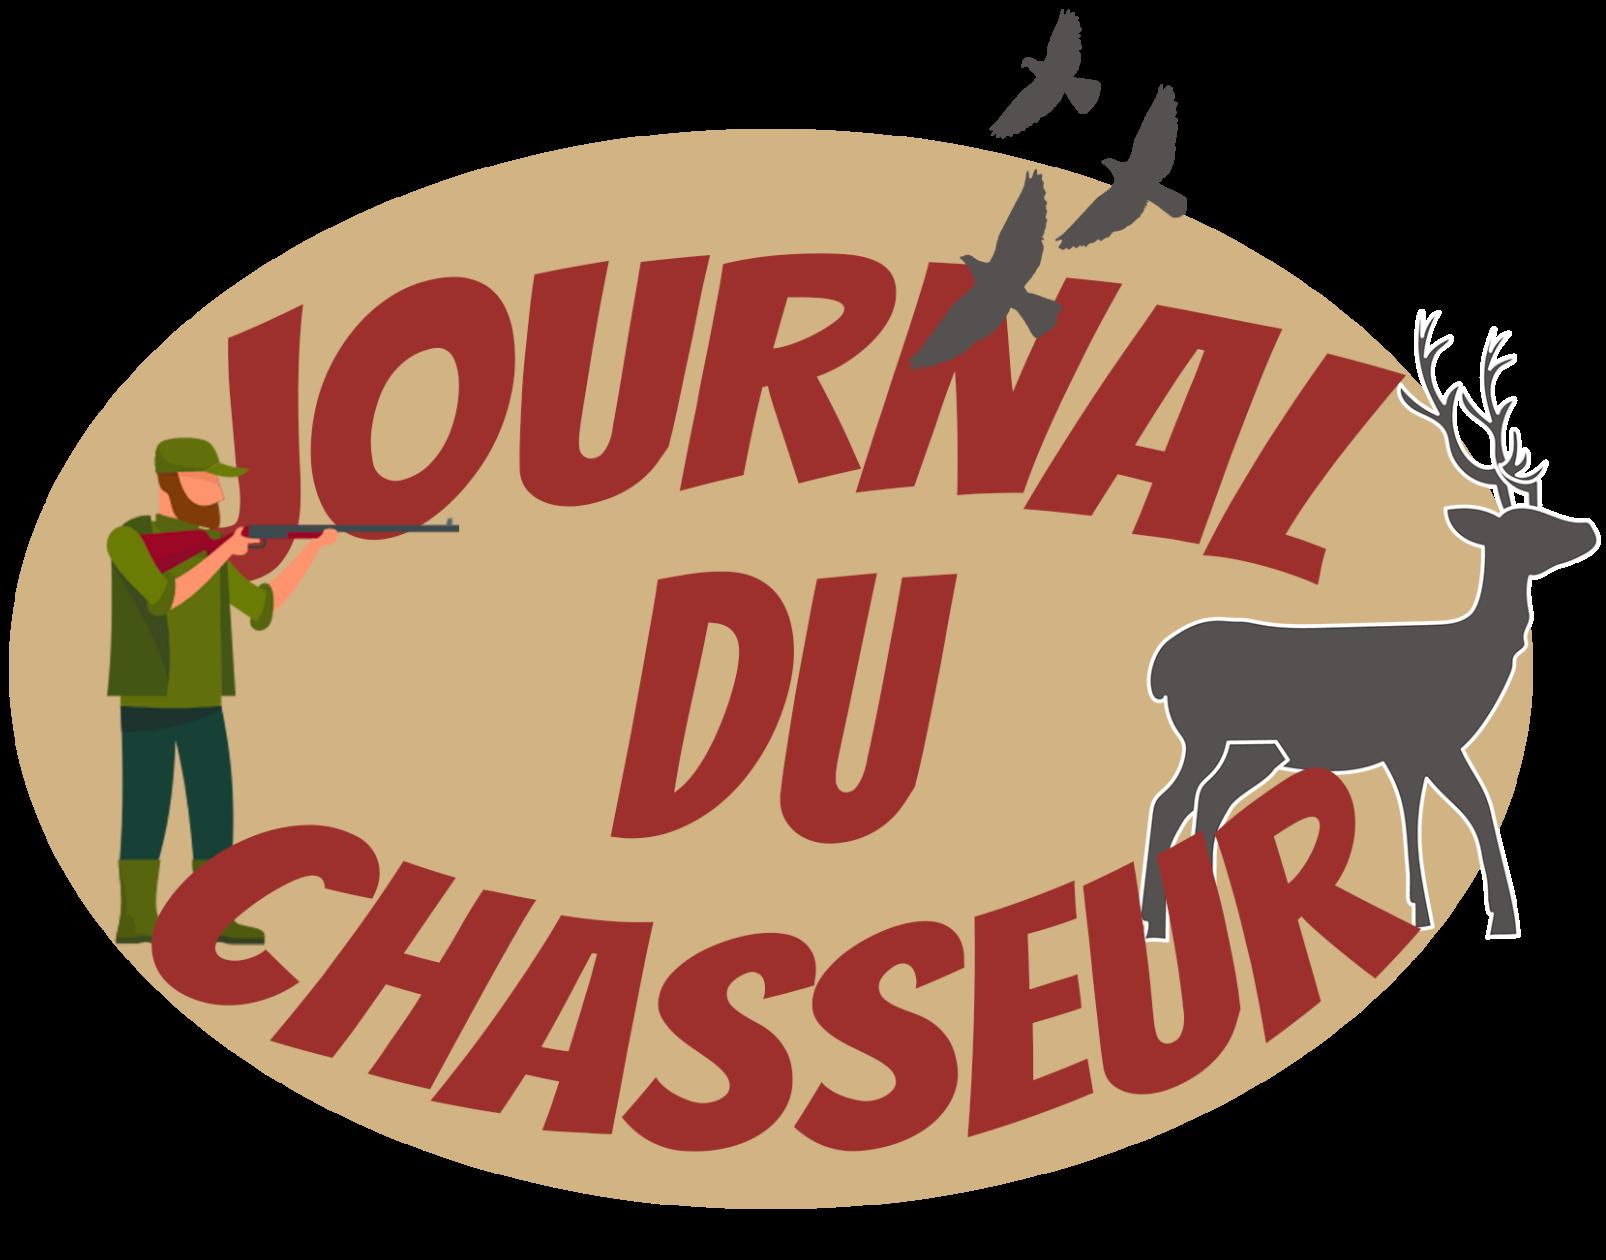 Journal du chasseur